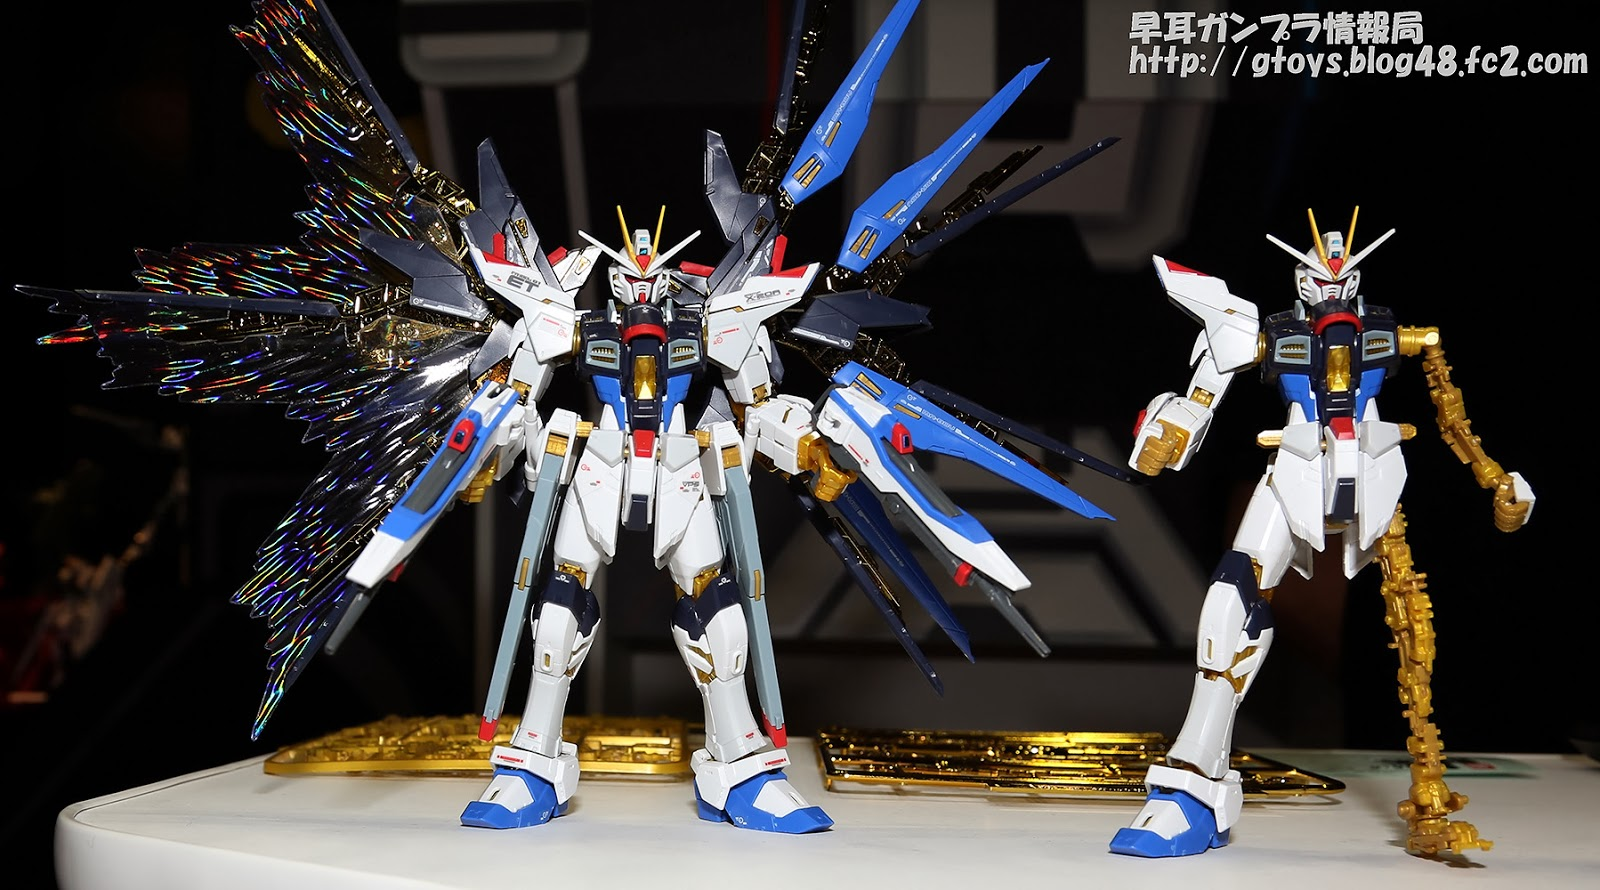 P-Bandai: RG 1/144 Strike Freedom Gundam Full Burst Mode Add On Unit ...